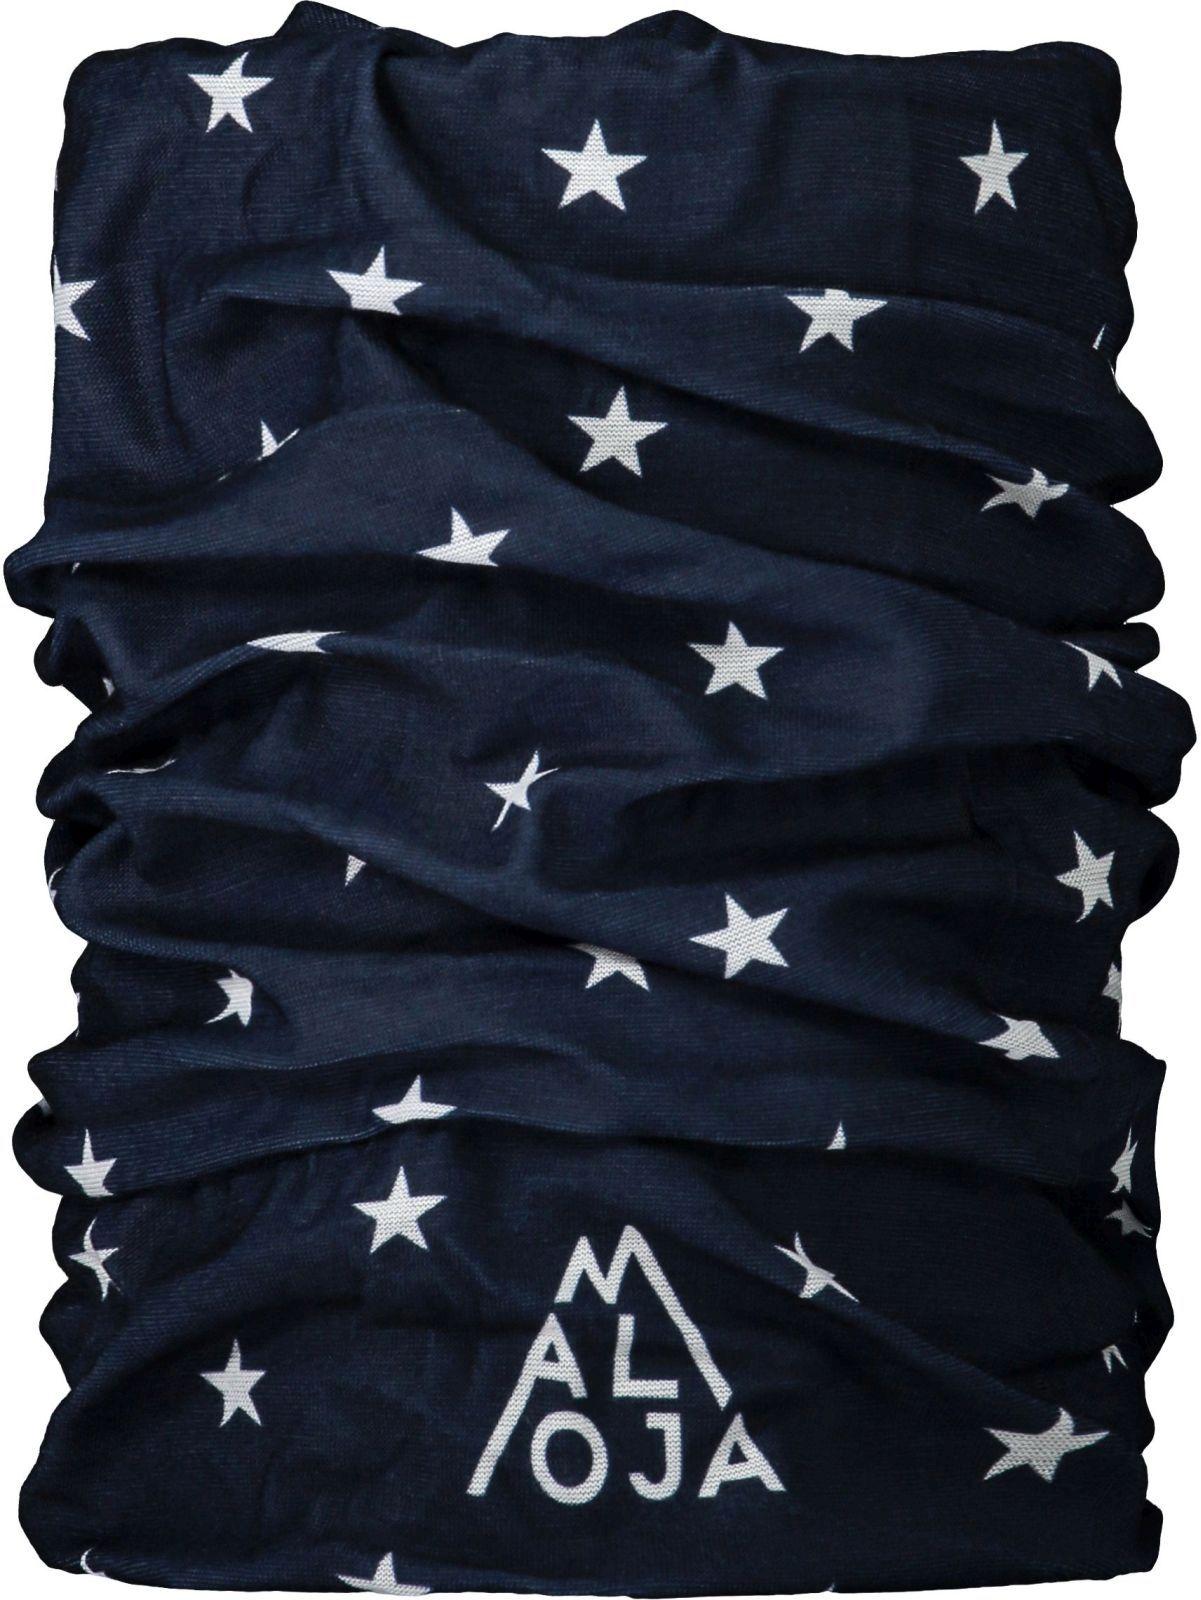 Maloja FondadaM - mountain lake stars uni